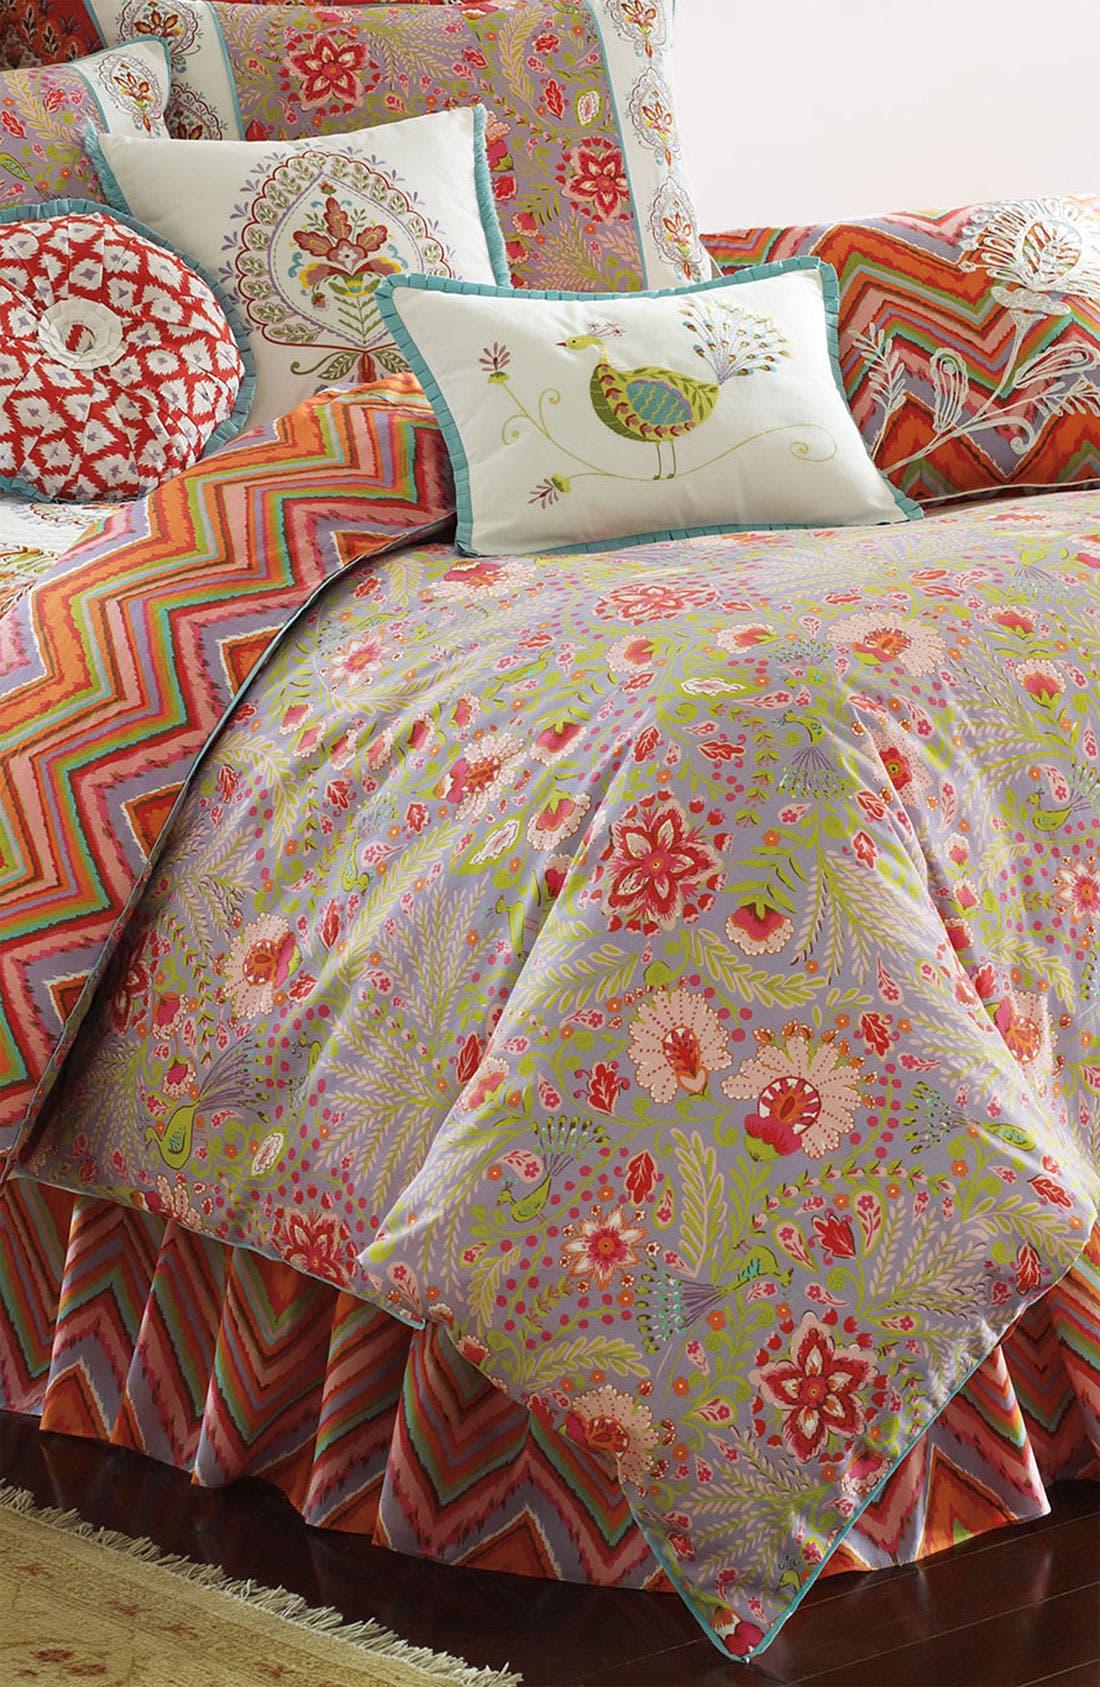 Alternate Image 1 Selected - Dena Home 'Paradiso' Comforter